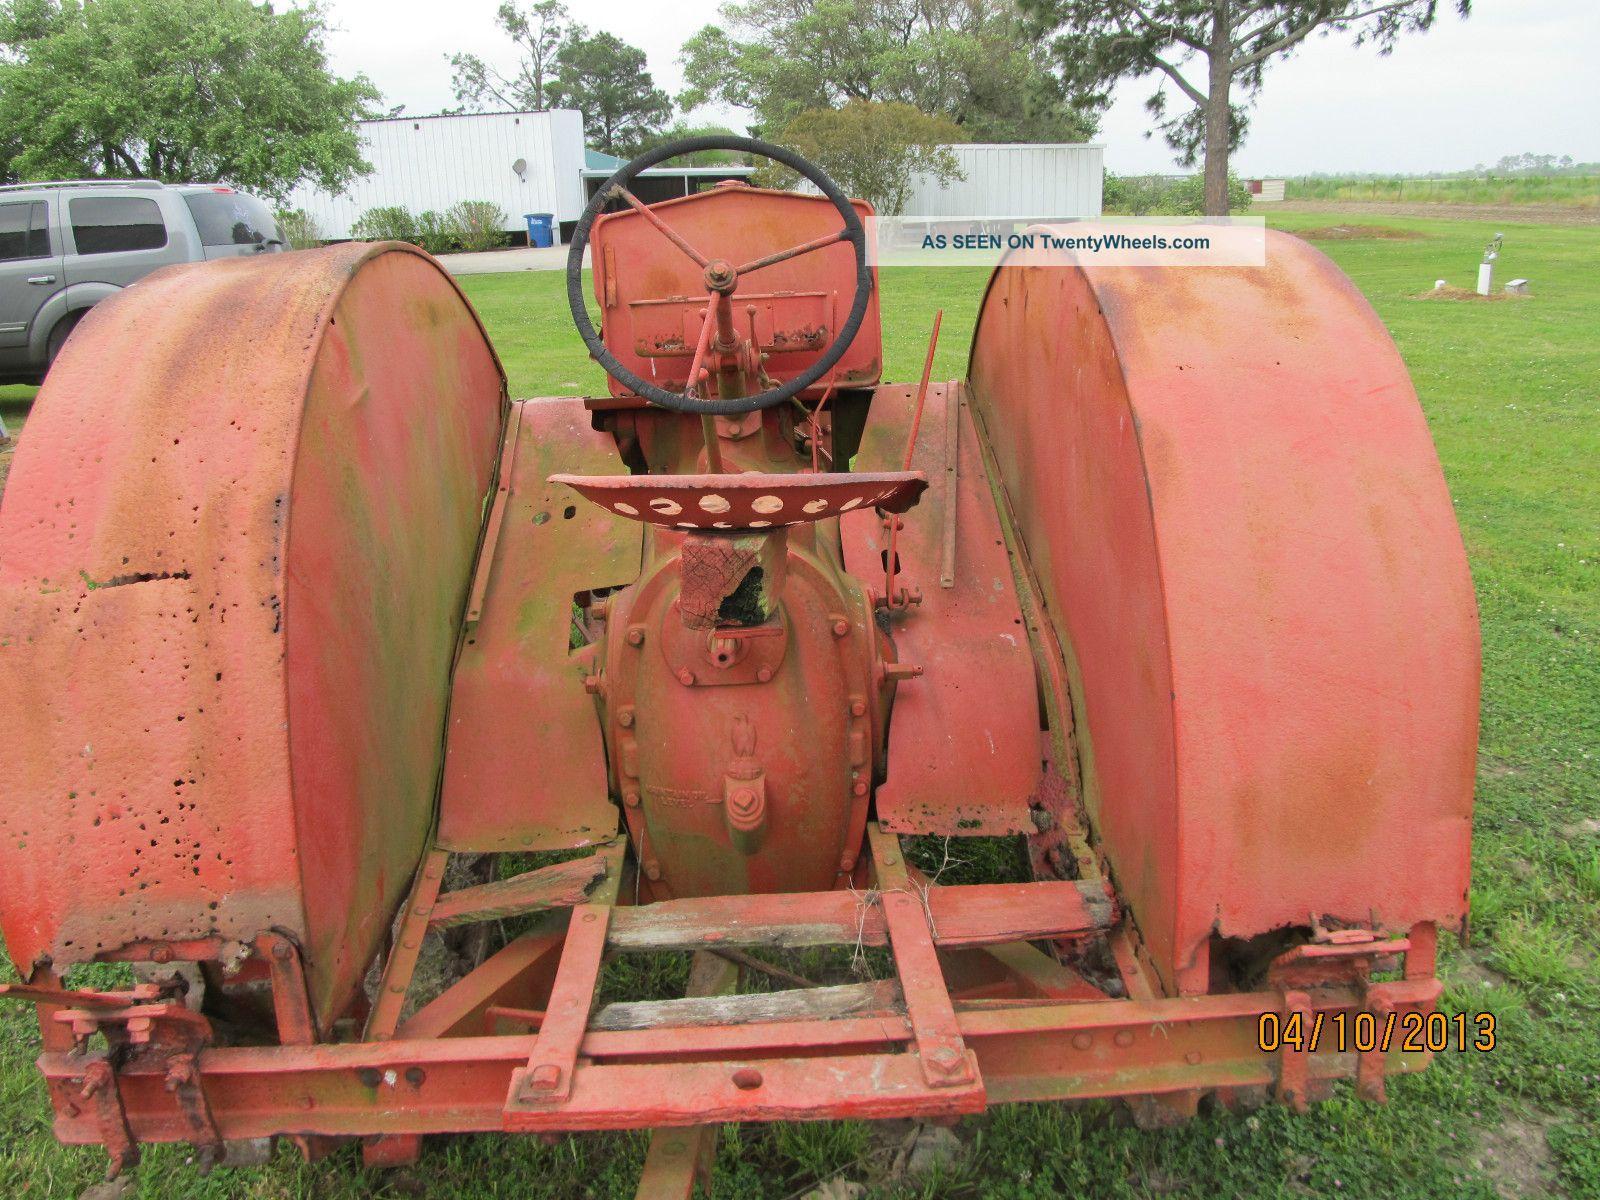 Case Model L Antique Tractor S Vintage Old Farm Equipment S Lgw